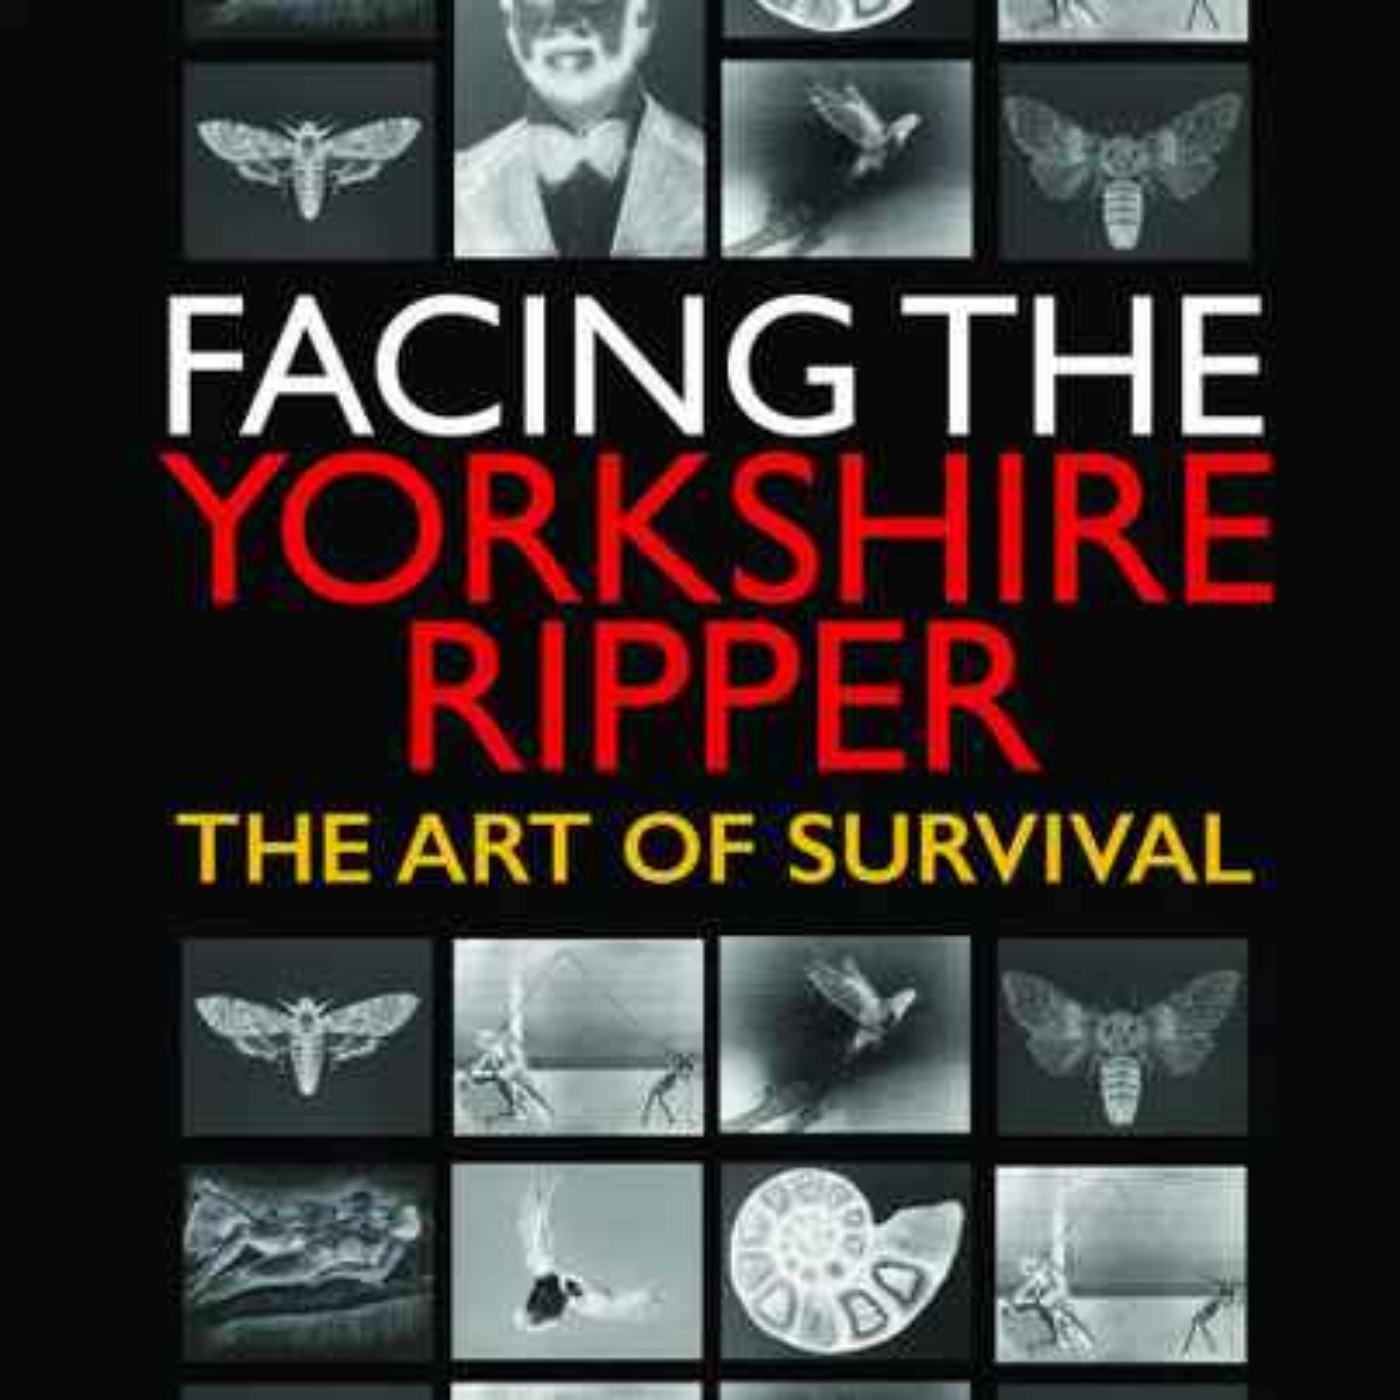 Mo Lea - Facing the Yorkshire Ripper